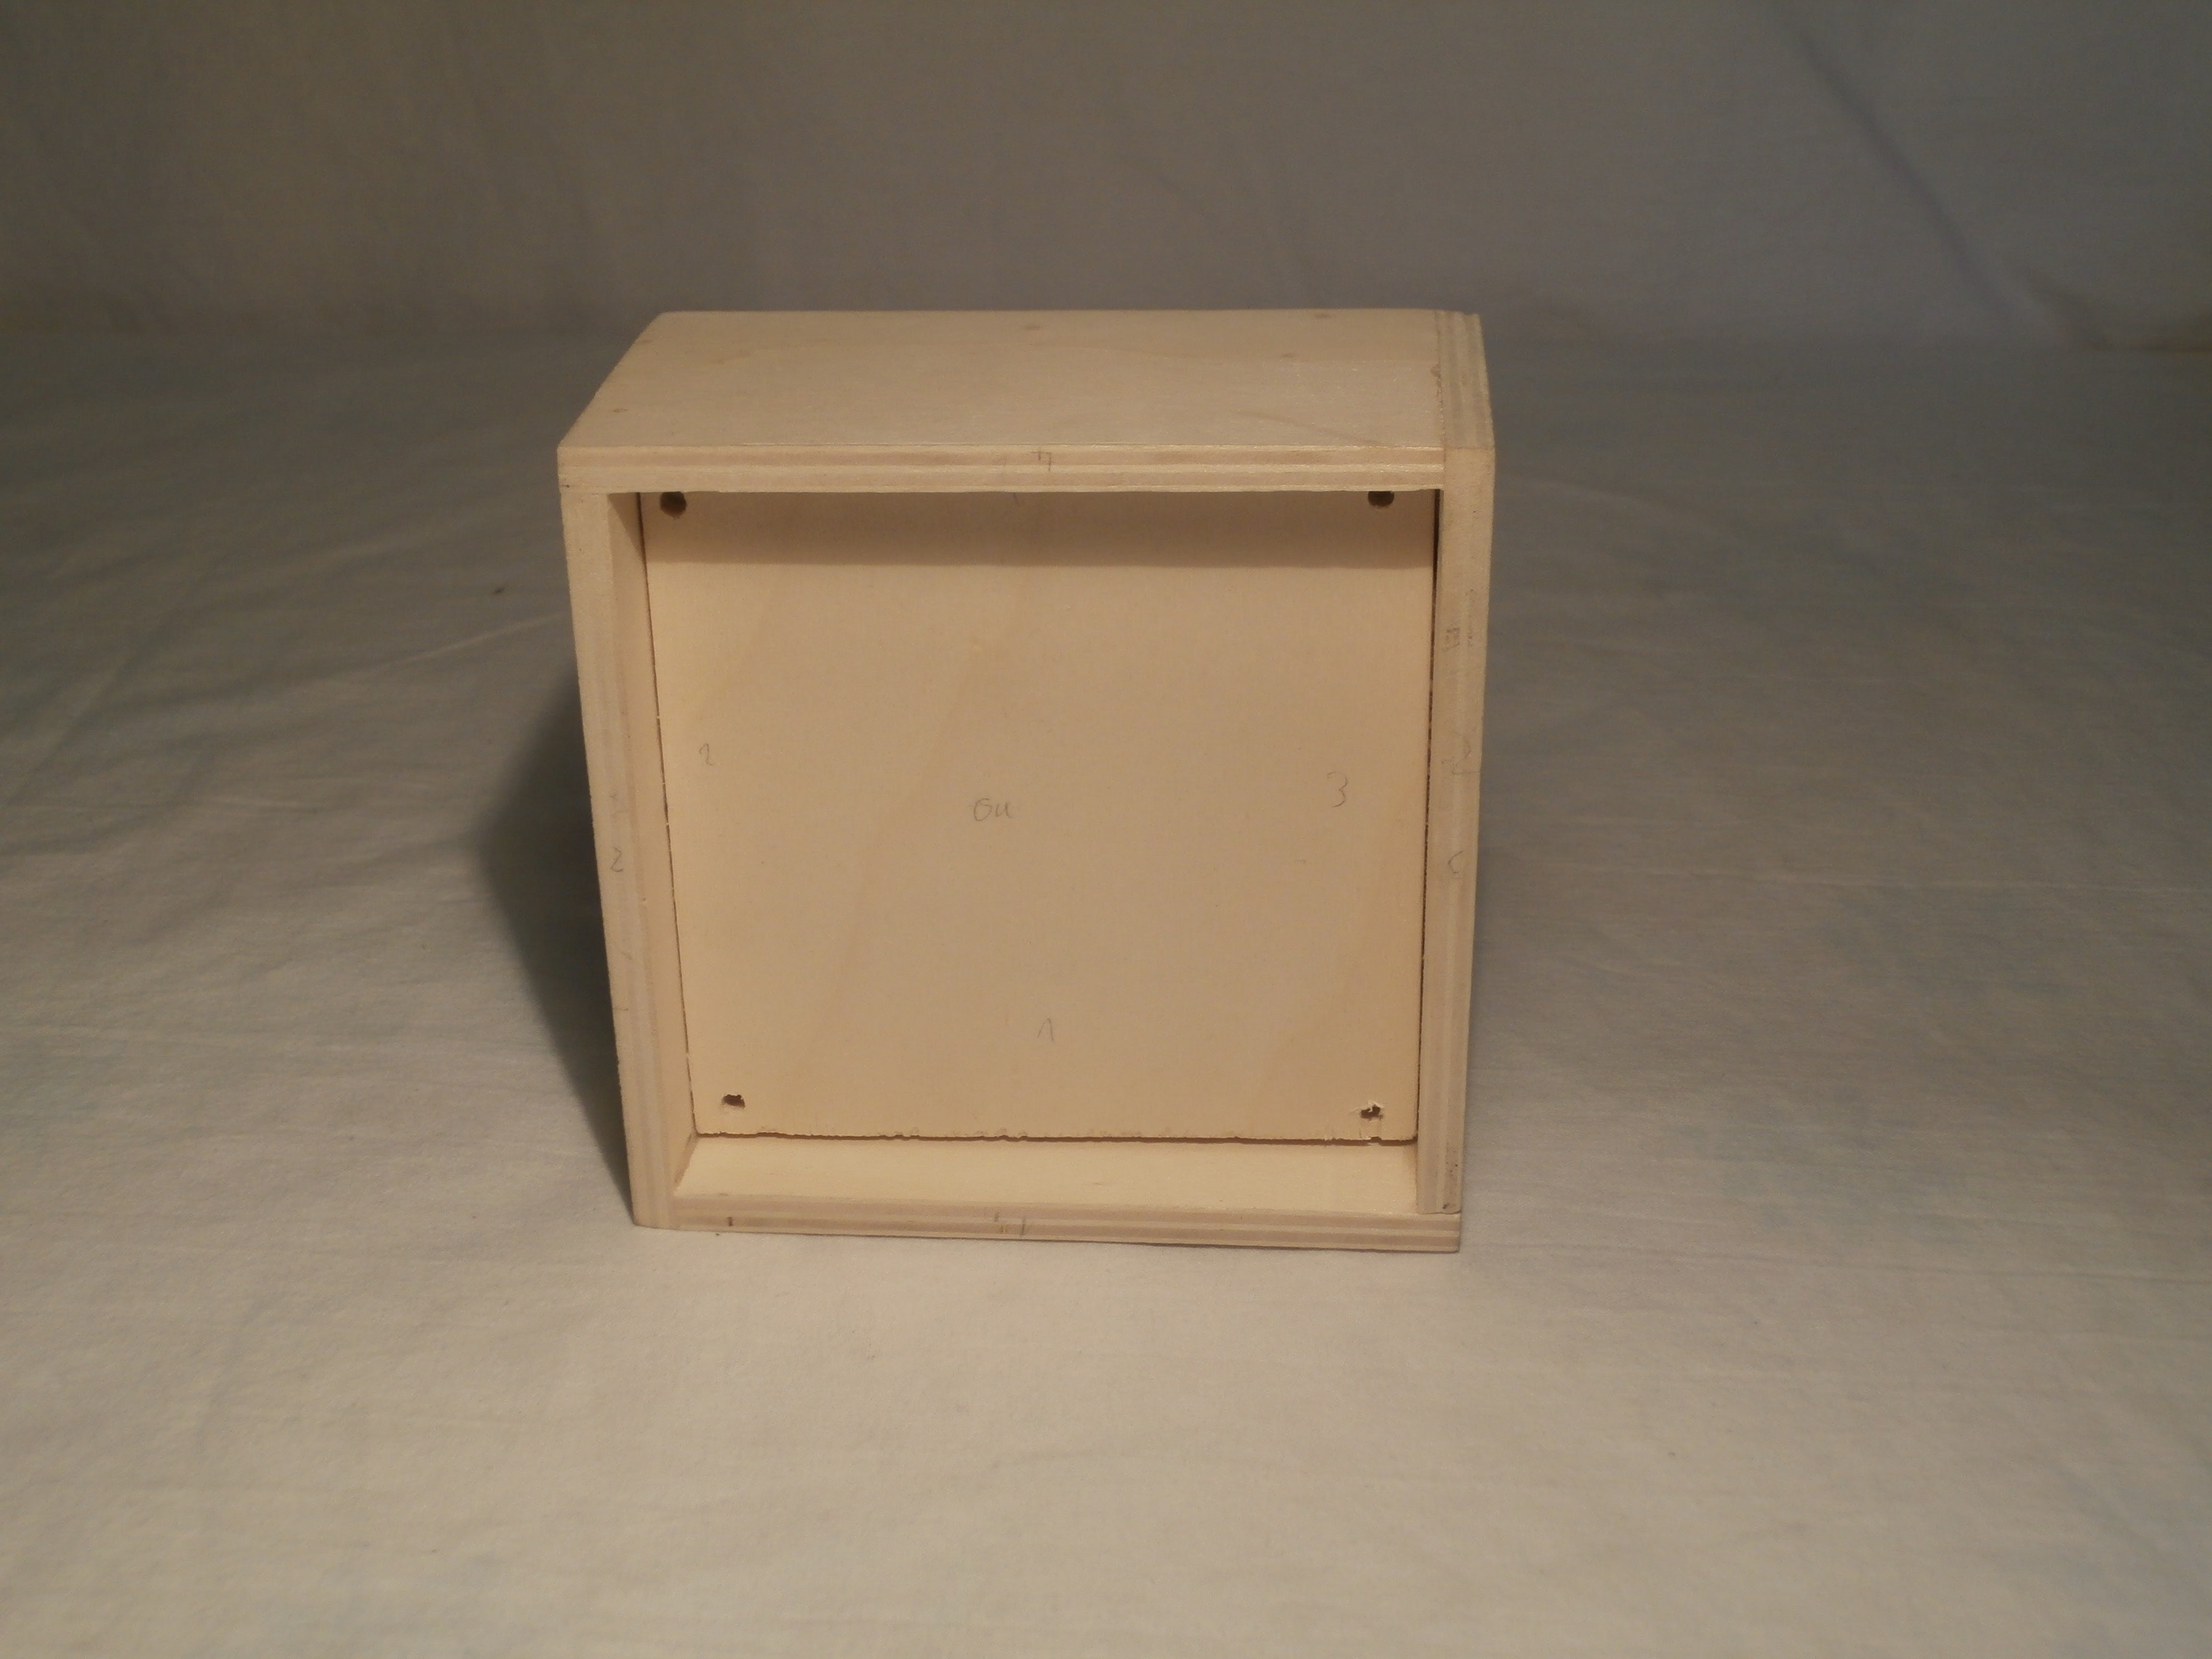 Box above